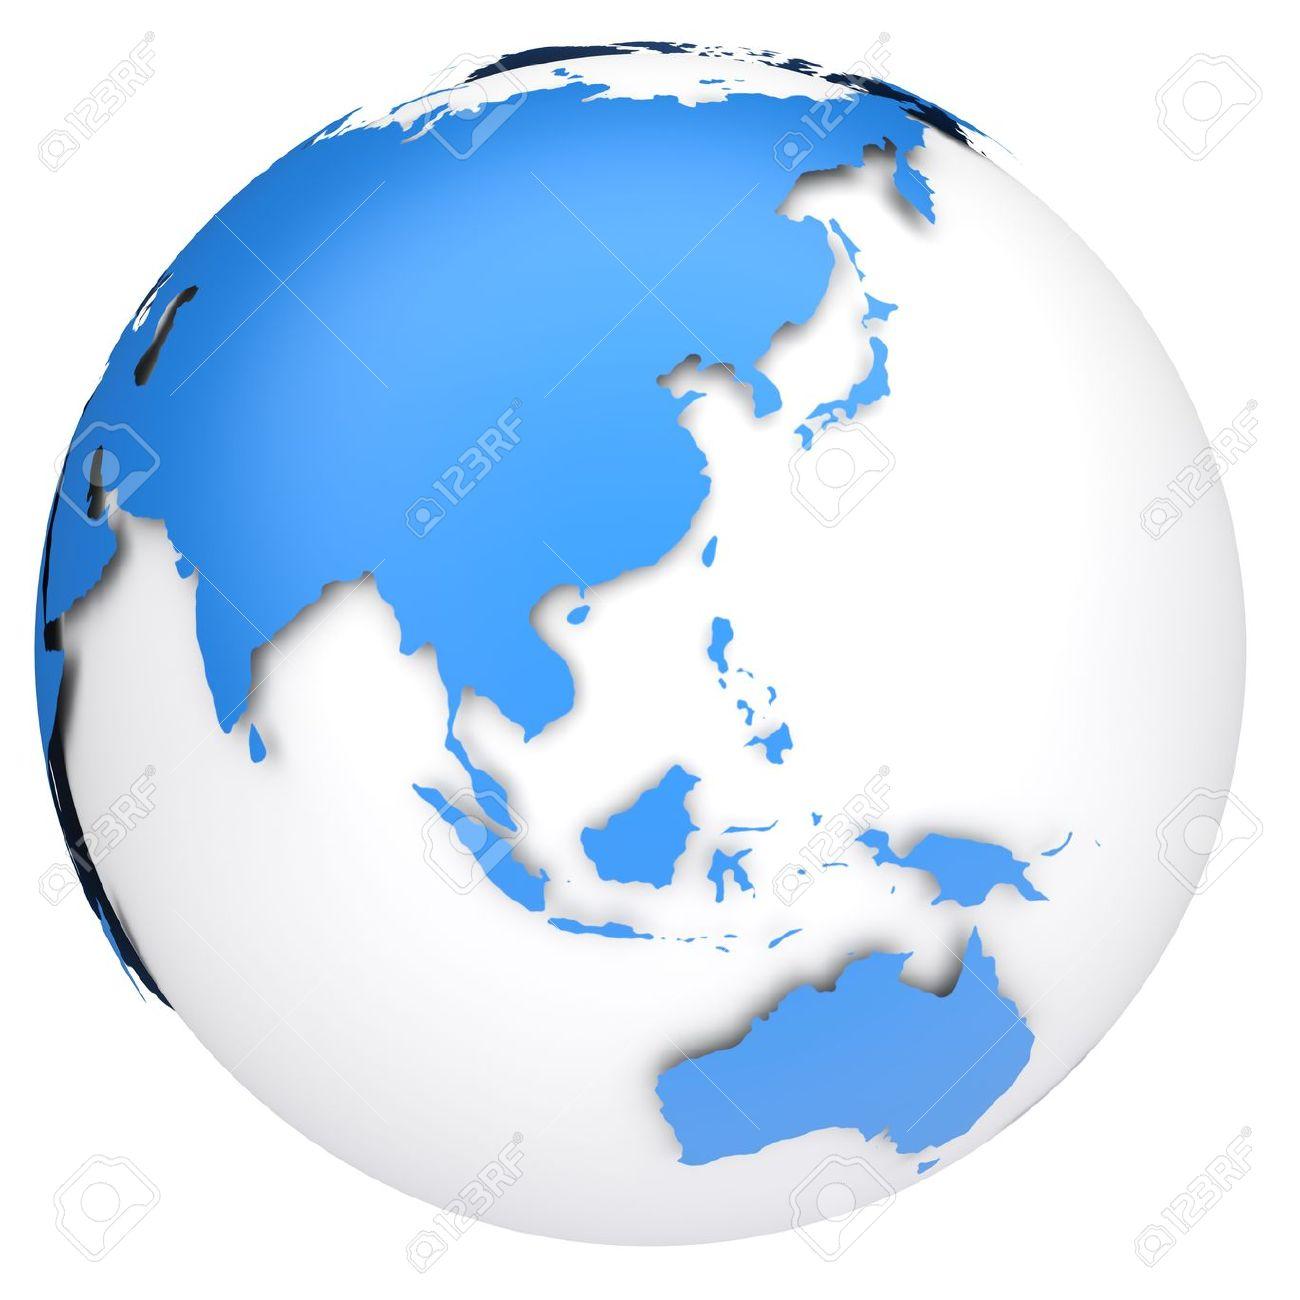 The world 世界